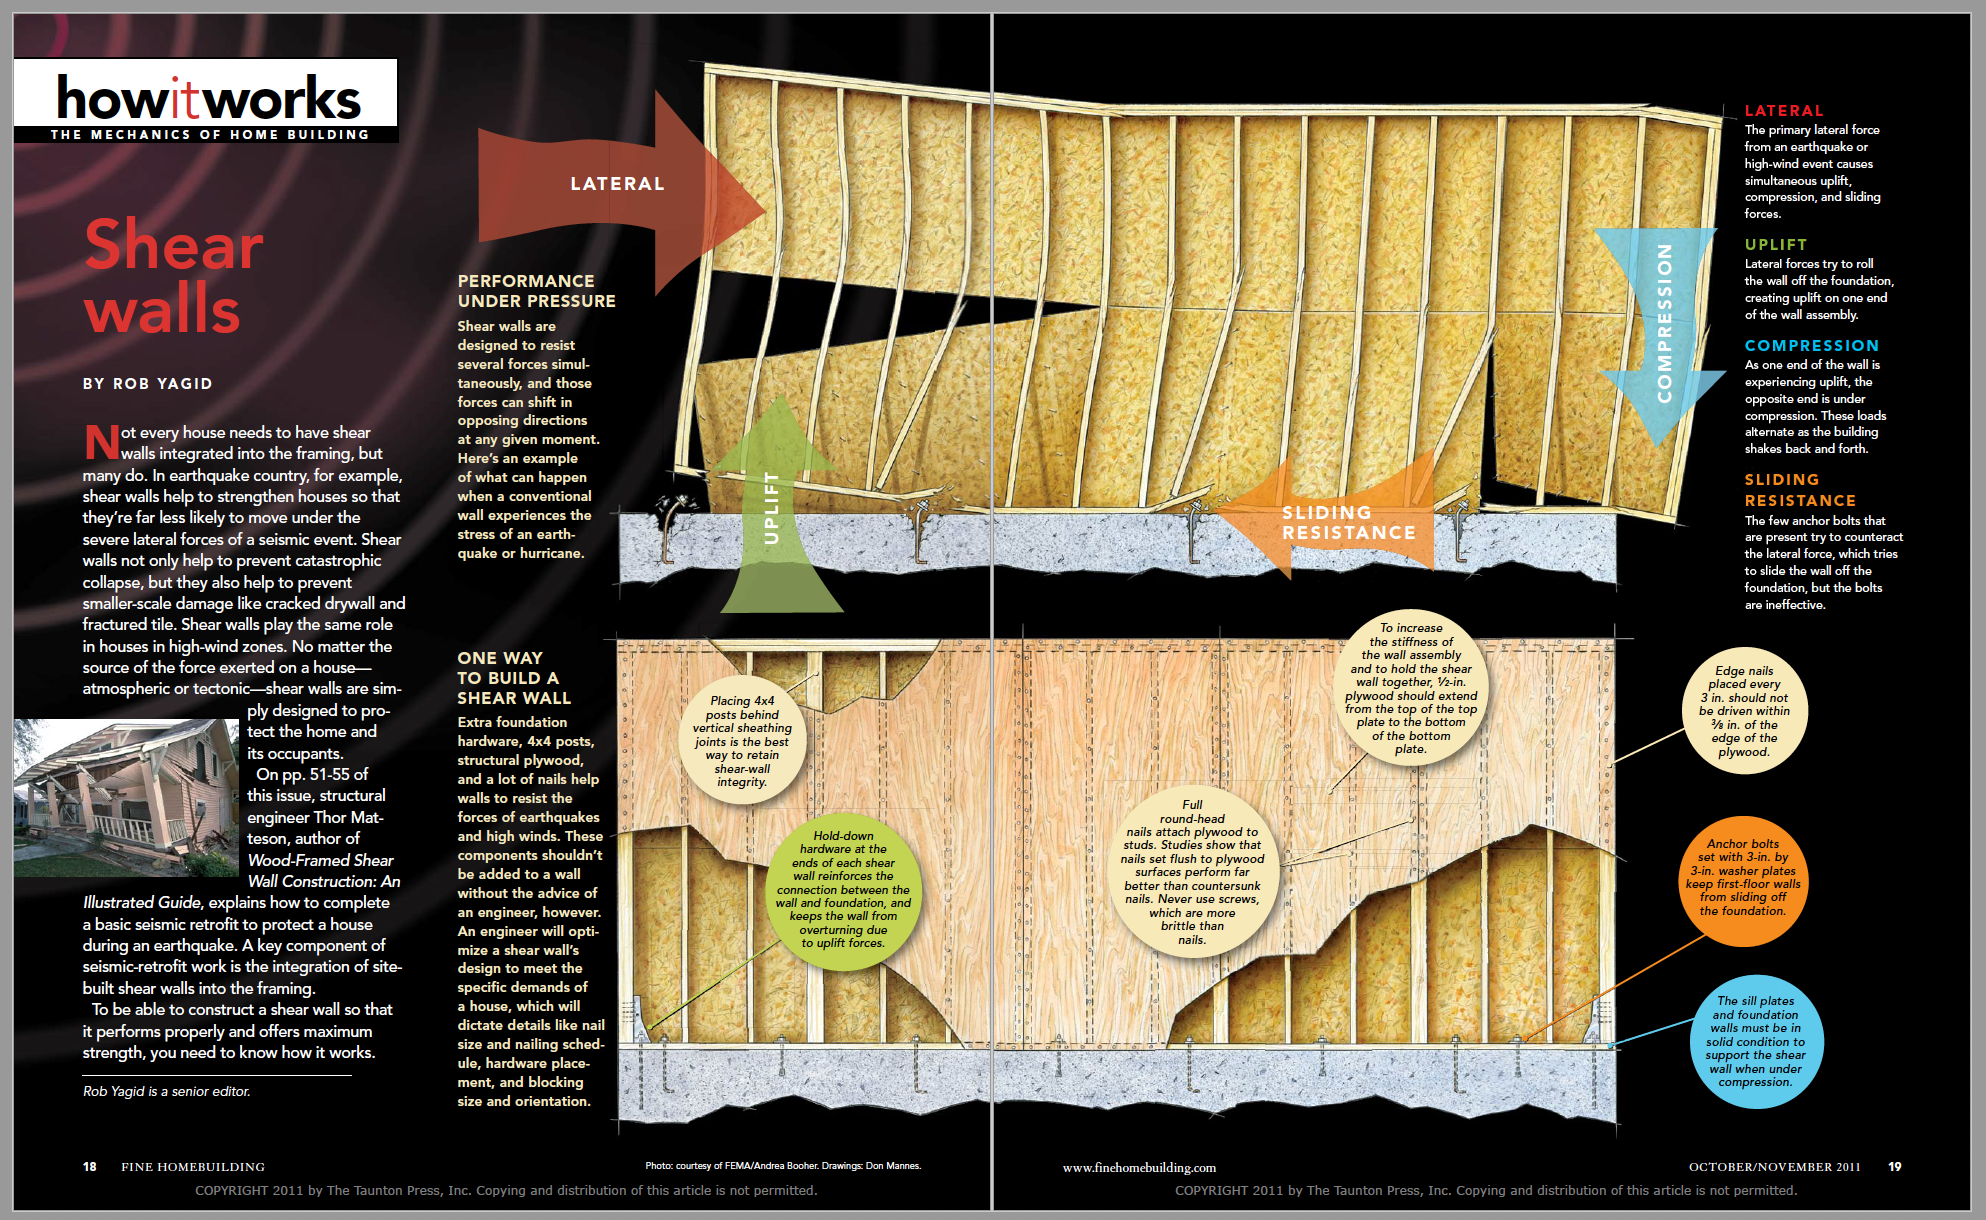 How it Works: Shear Walls Spread Img